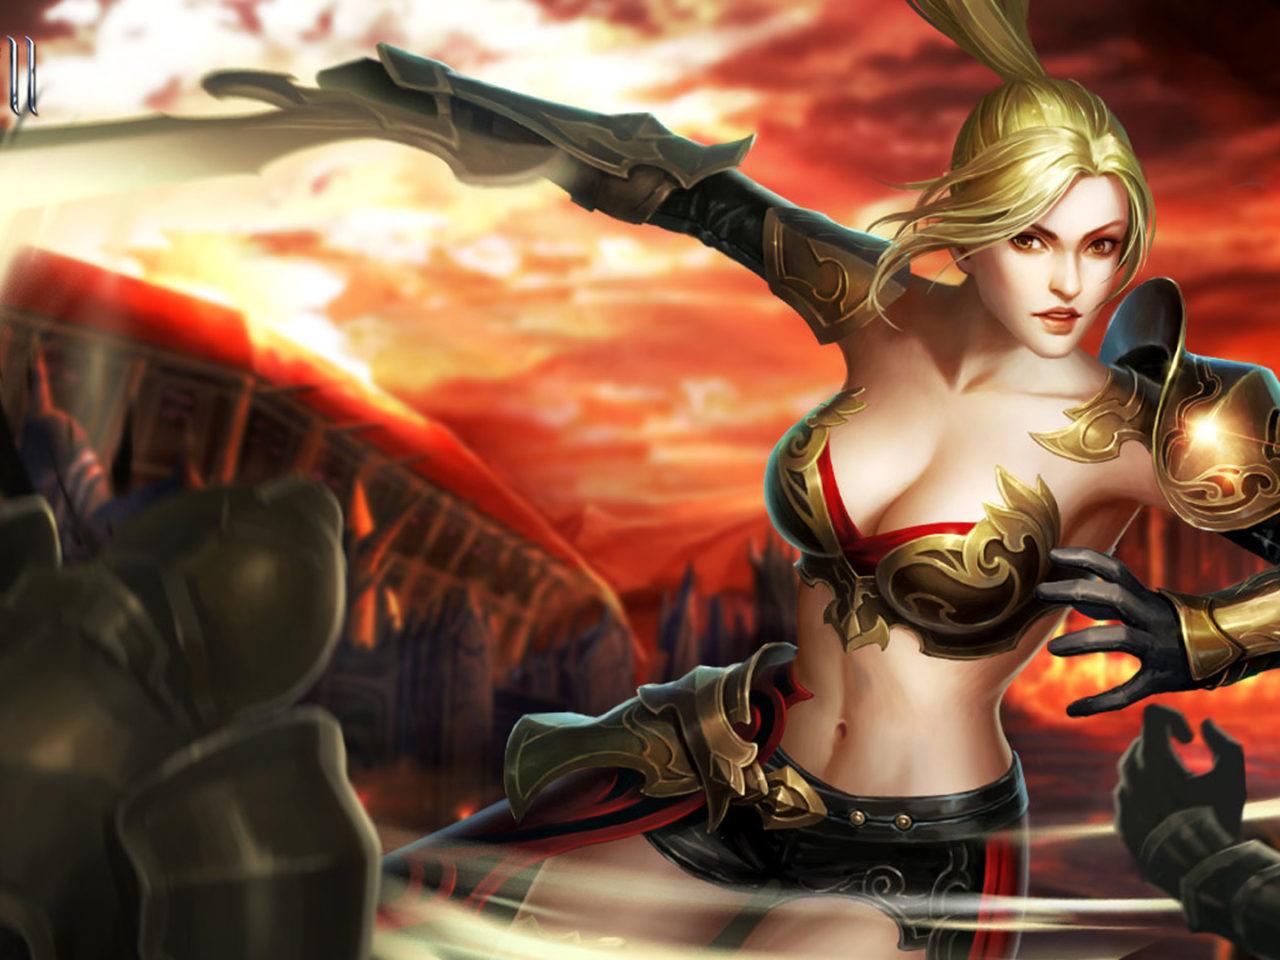 Www New Hd Girl Wallpaper Com League Of Angels 2 Karen Fantasy Girl Warrior Game Loa Art